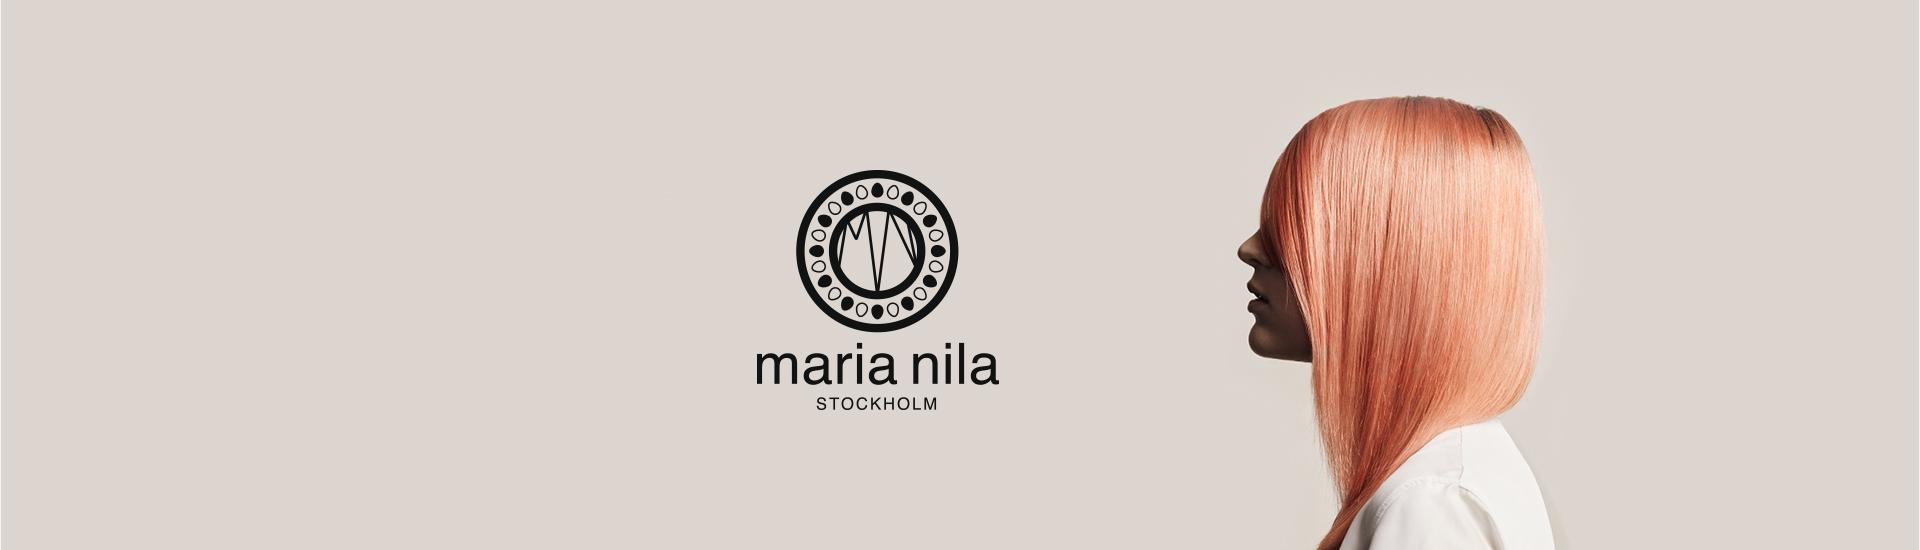 Maria Nila 1920x550